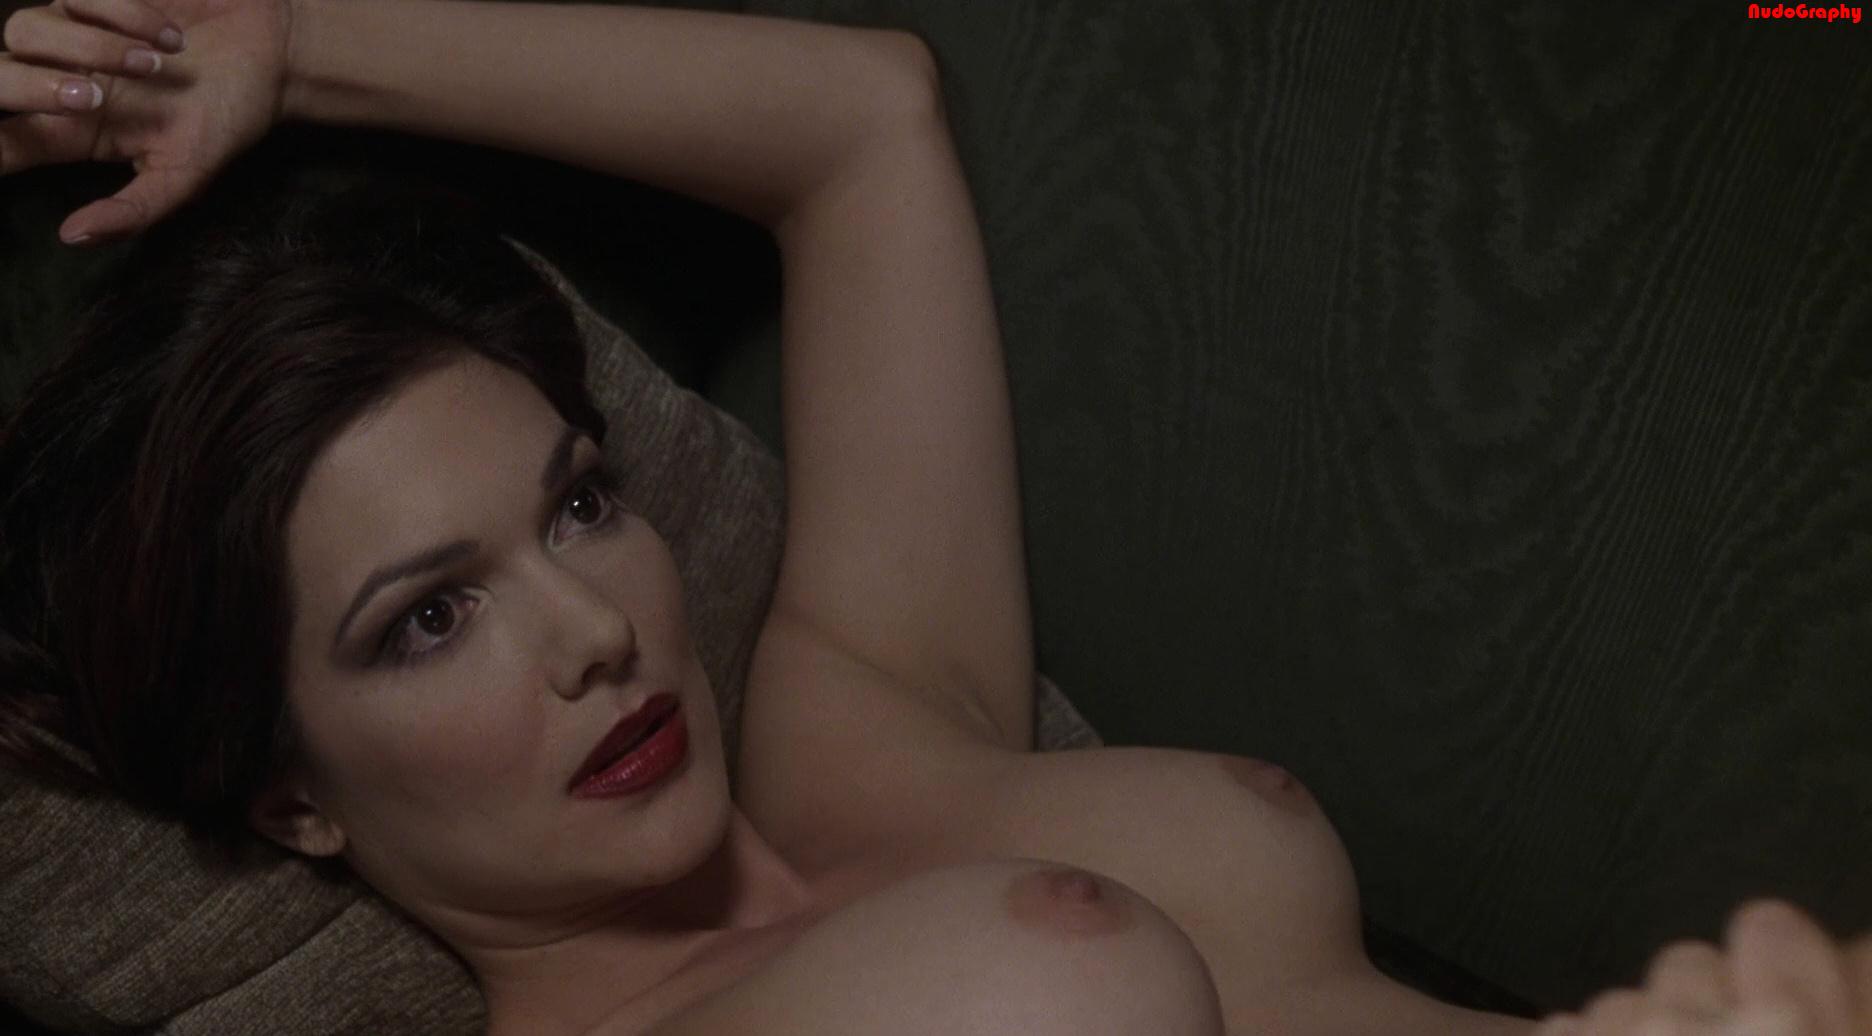 Porn star Dr laura nude photos woman